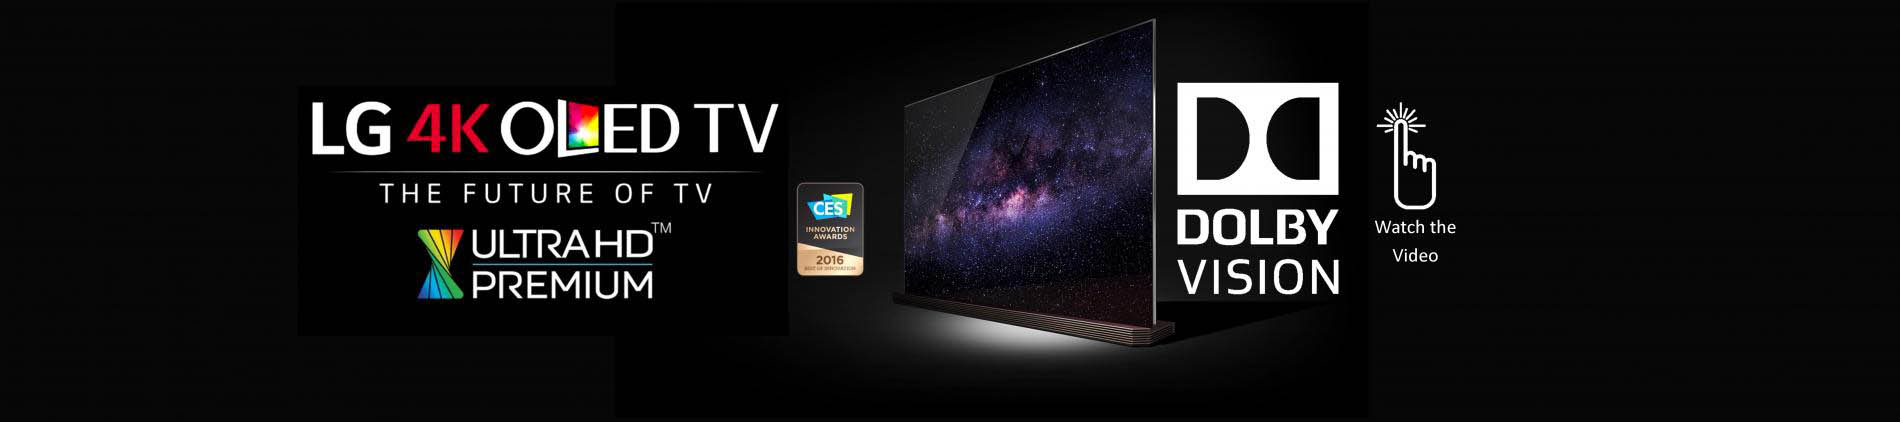 LG OLED HDR, 4K HDR, High Dynamic Range, Dolby Vision